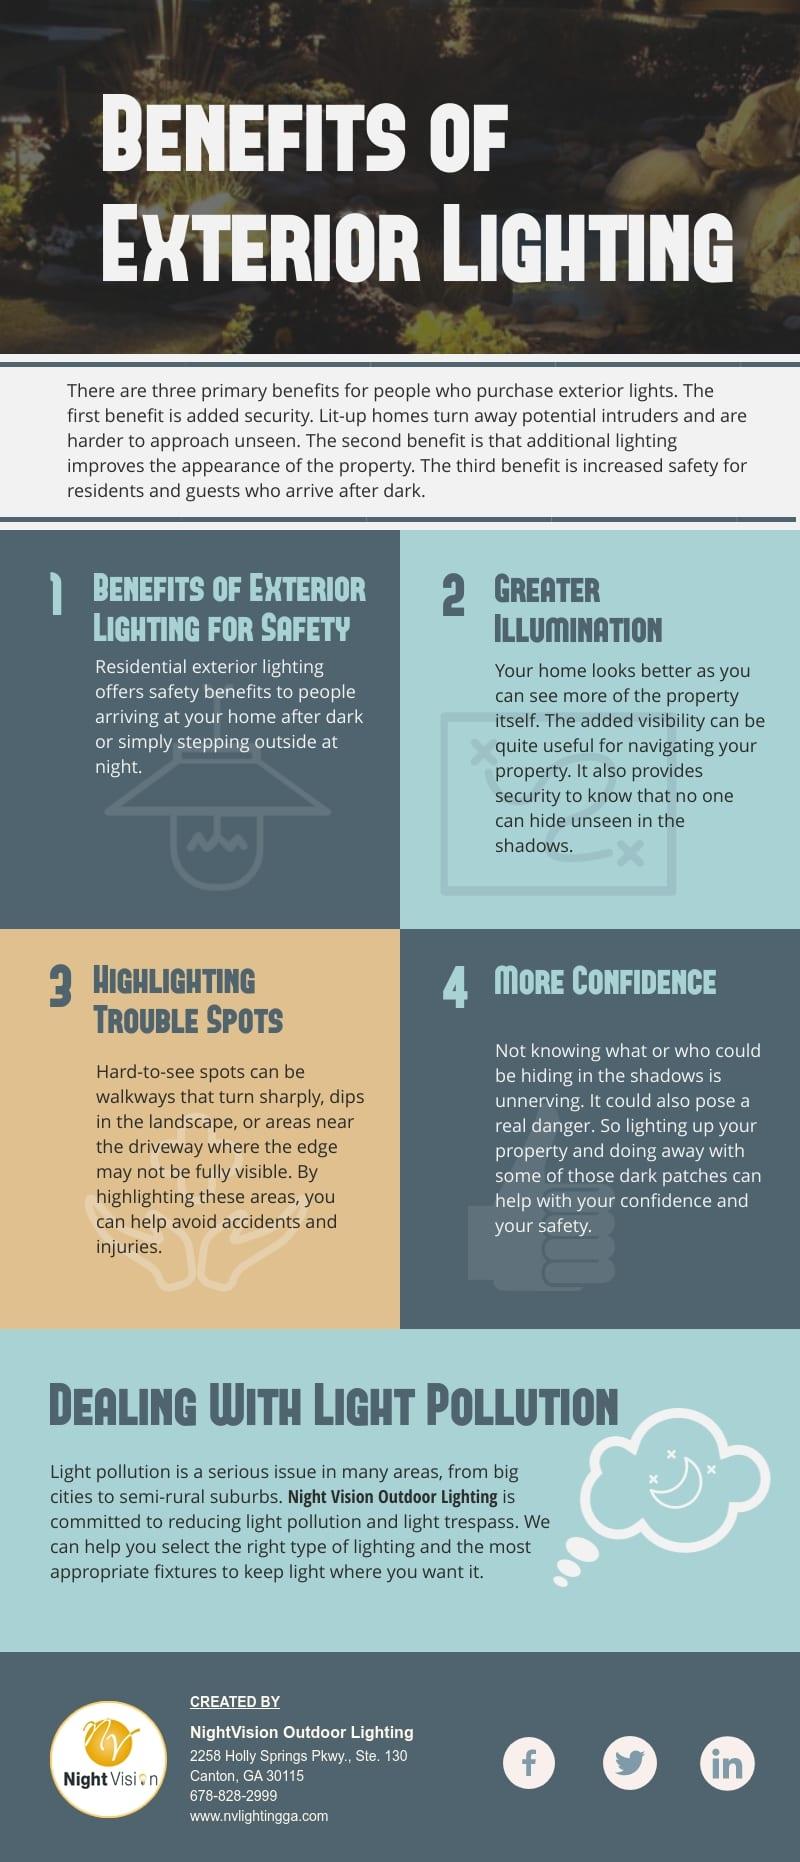 Benefits of Exterior Lighting [infographic]